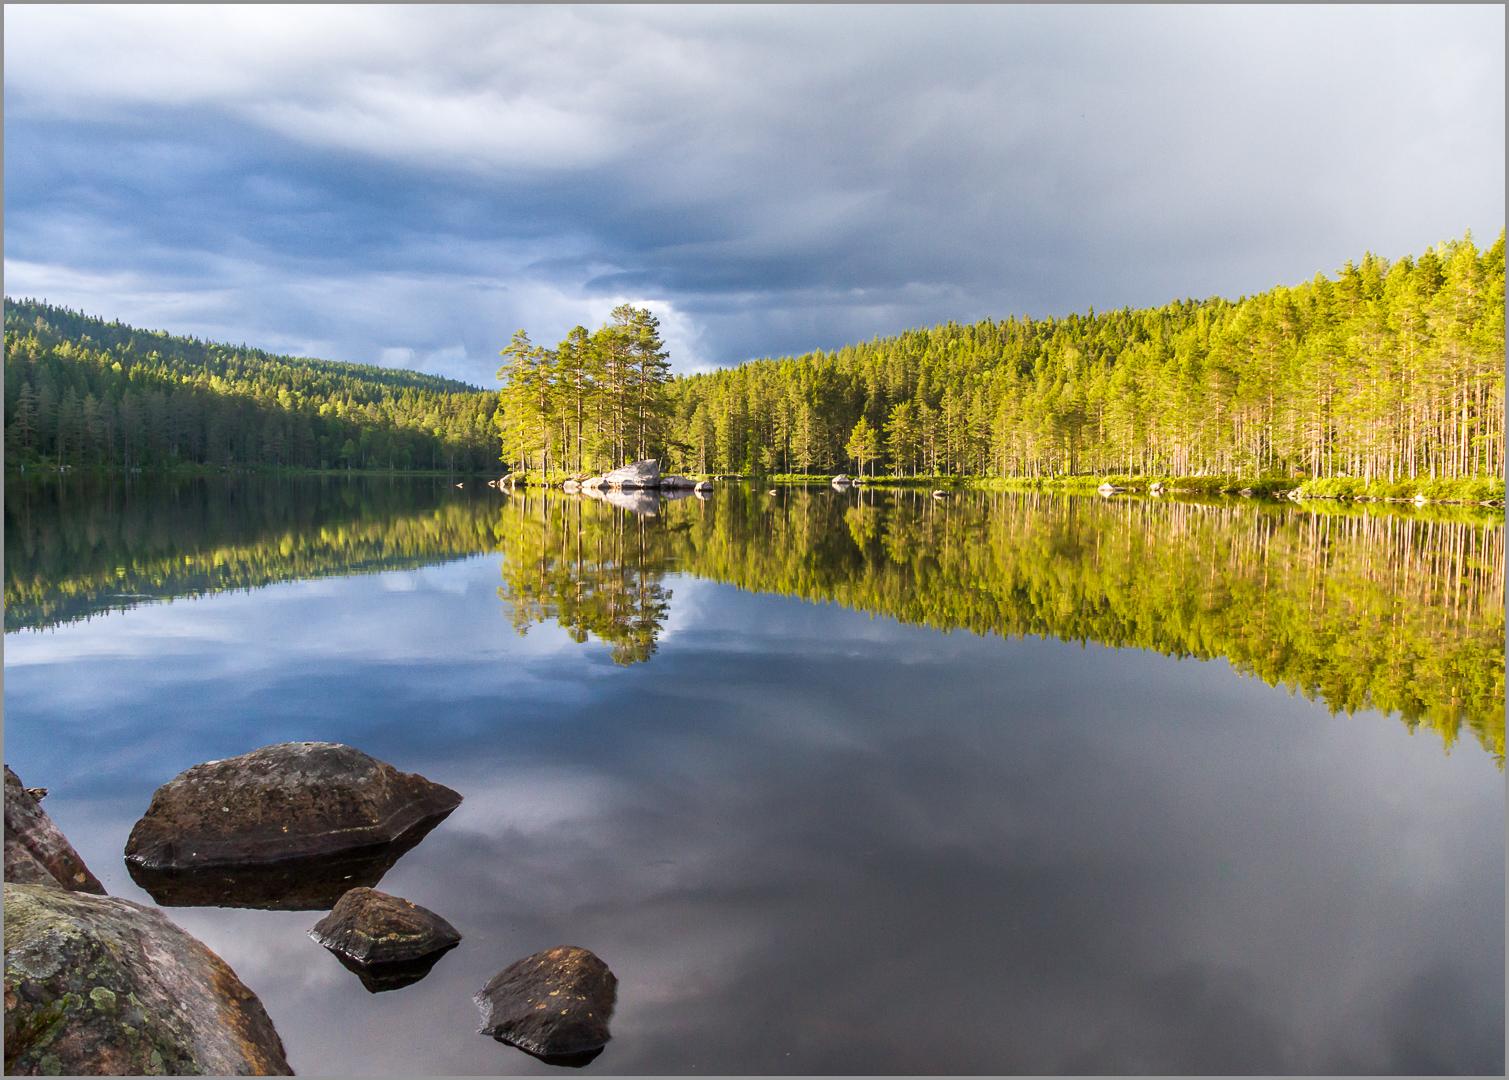 Open_LakeInSweden_ElizabethRiley_ABGr_Merit